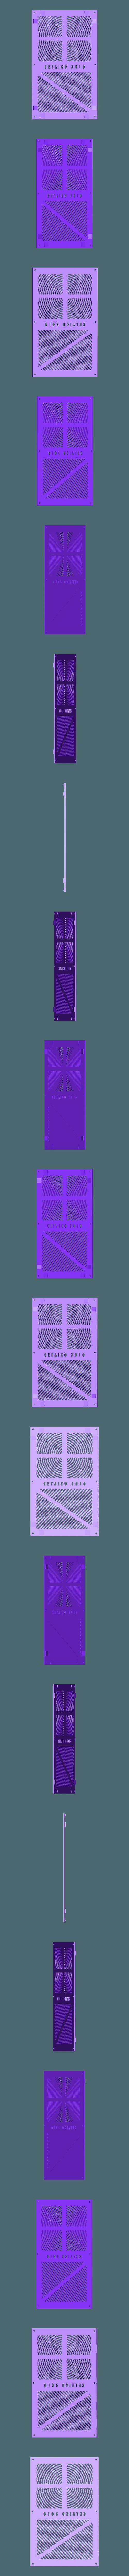 Tapa_Caja_XXL.stl Télécharger fichier STL gratuit Caja XXL para placa Zonestar ZRIB para montar 3 Mosfet • Modèle à imprimer en 3D, celtarra12